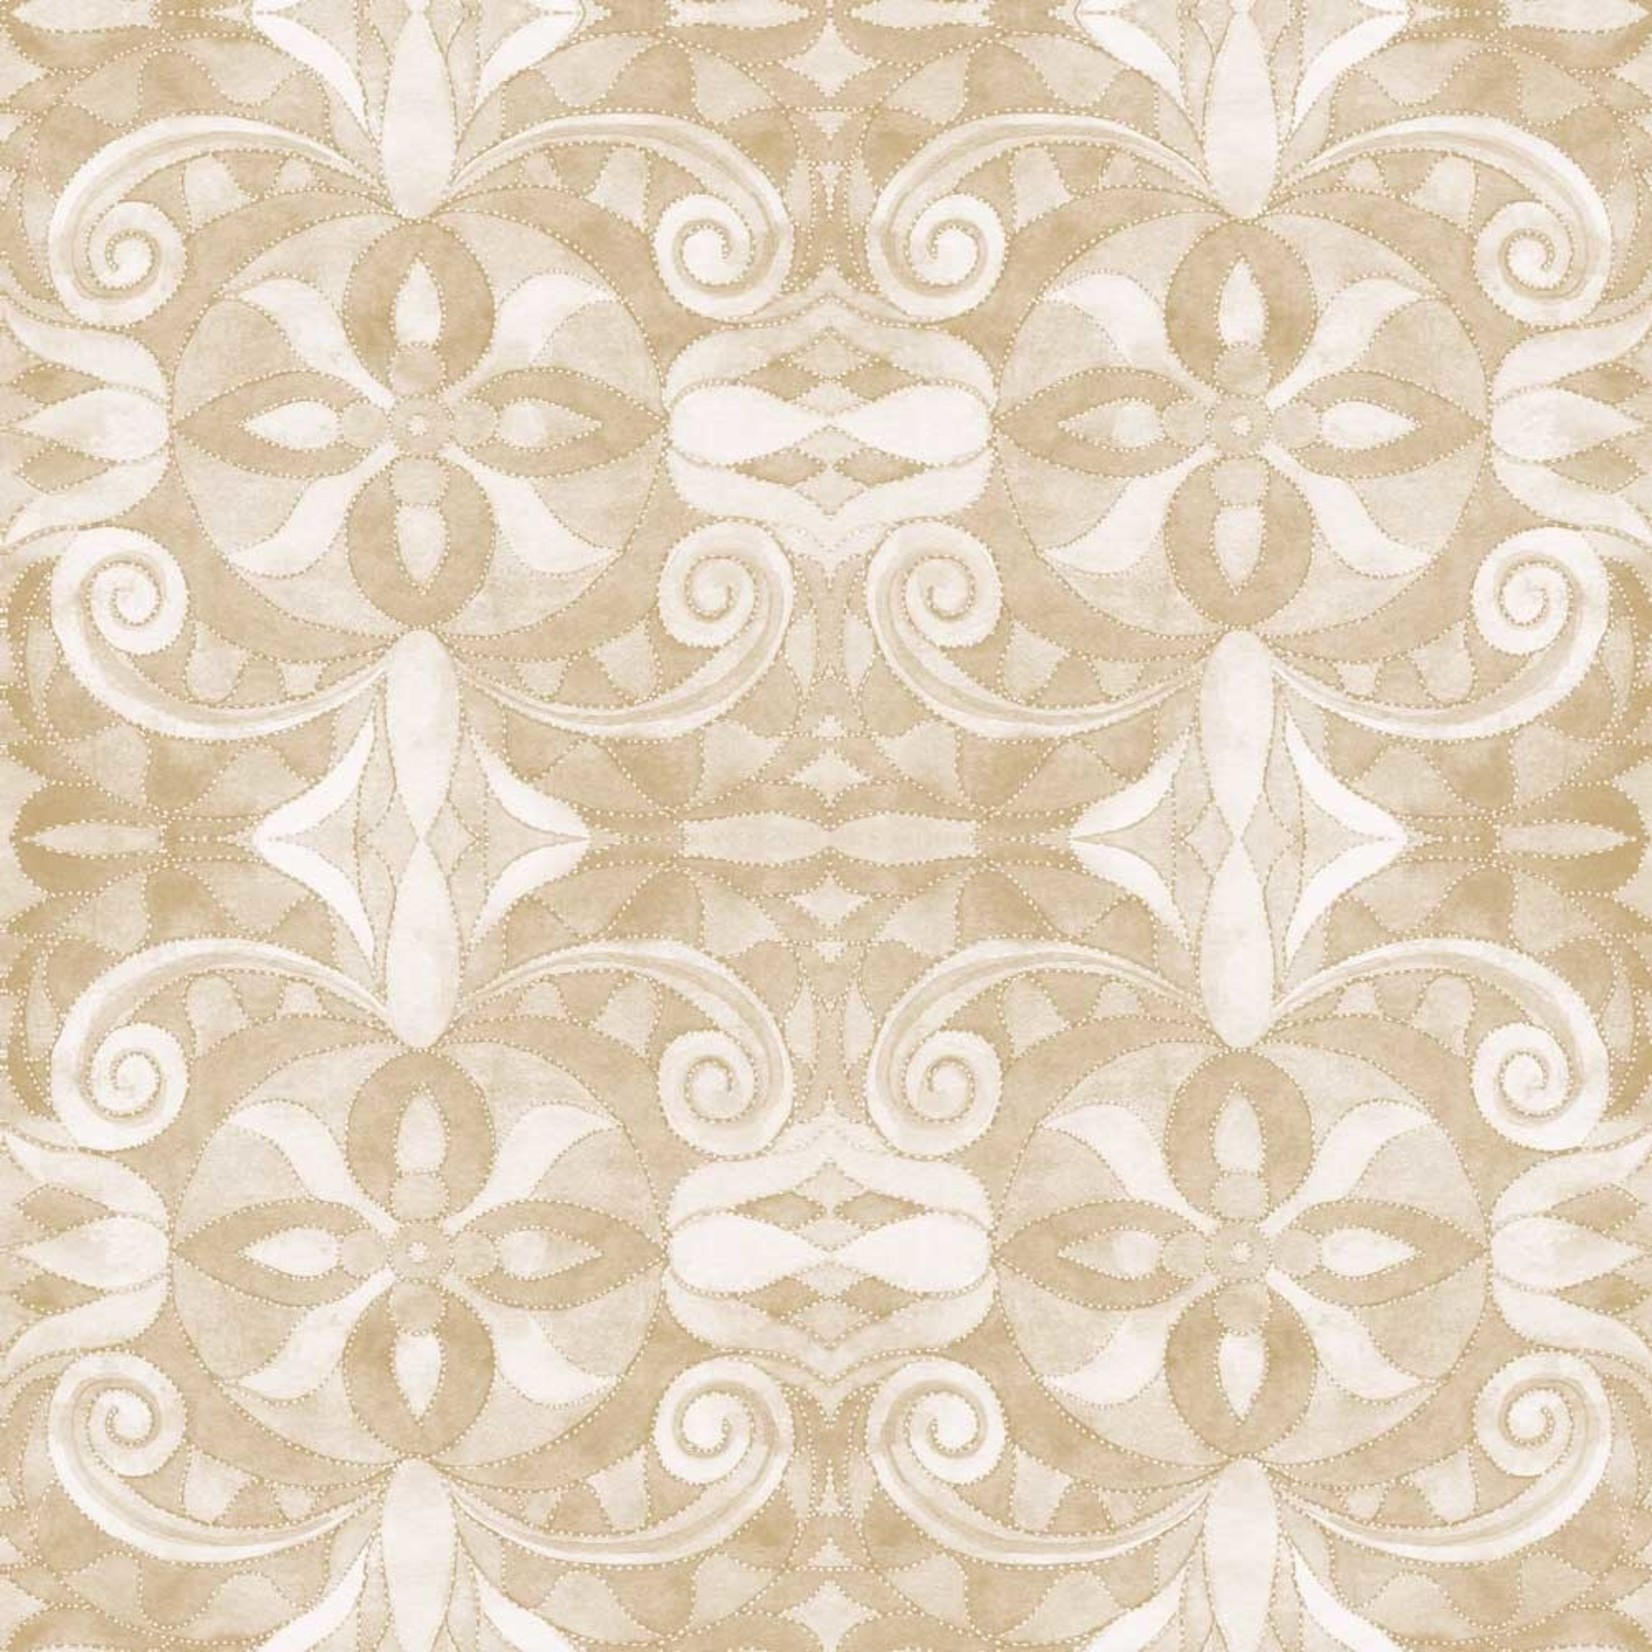 Blank Quilting Baroque - Beige